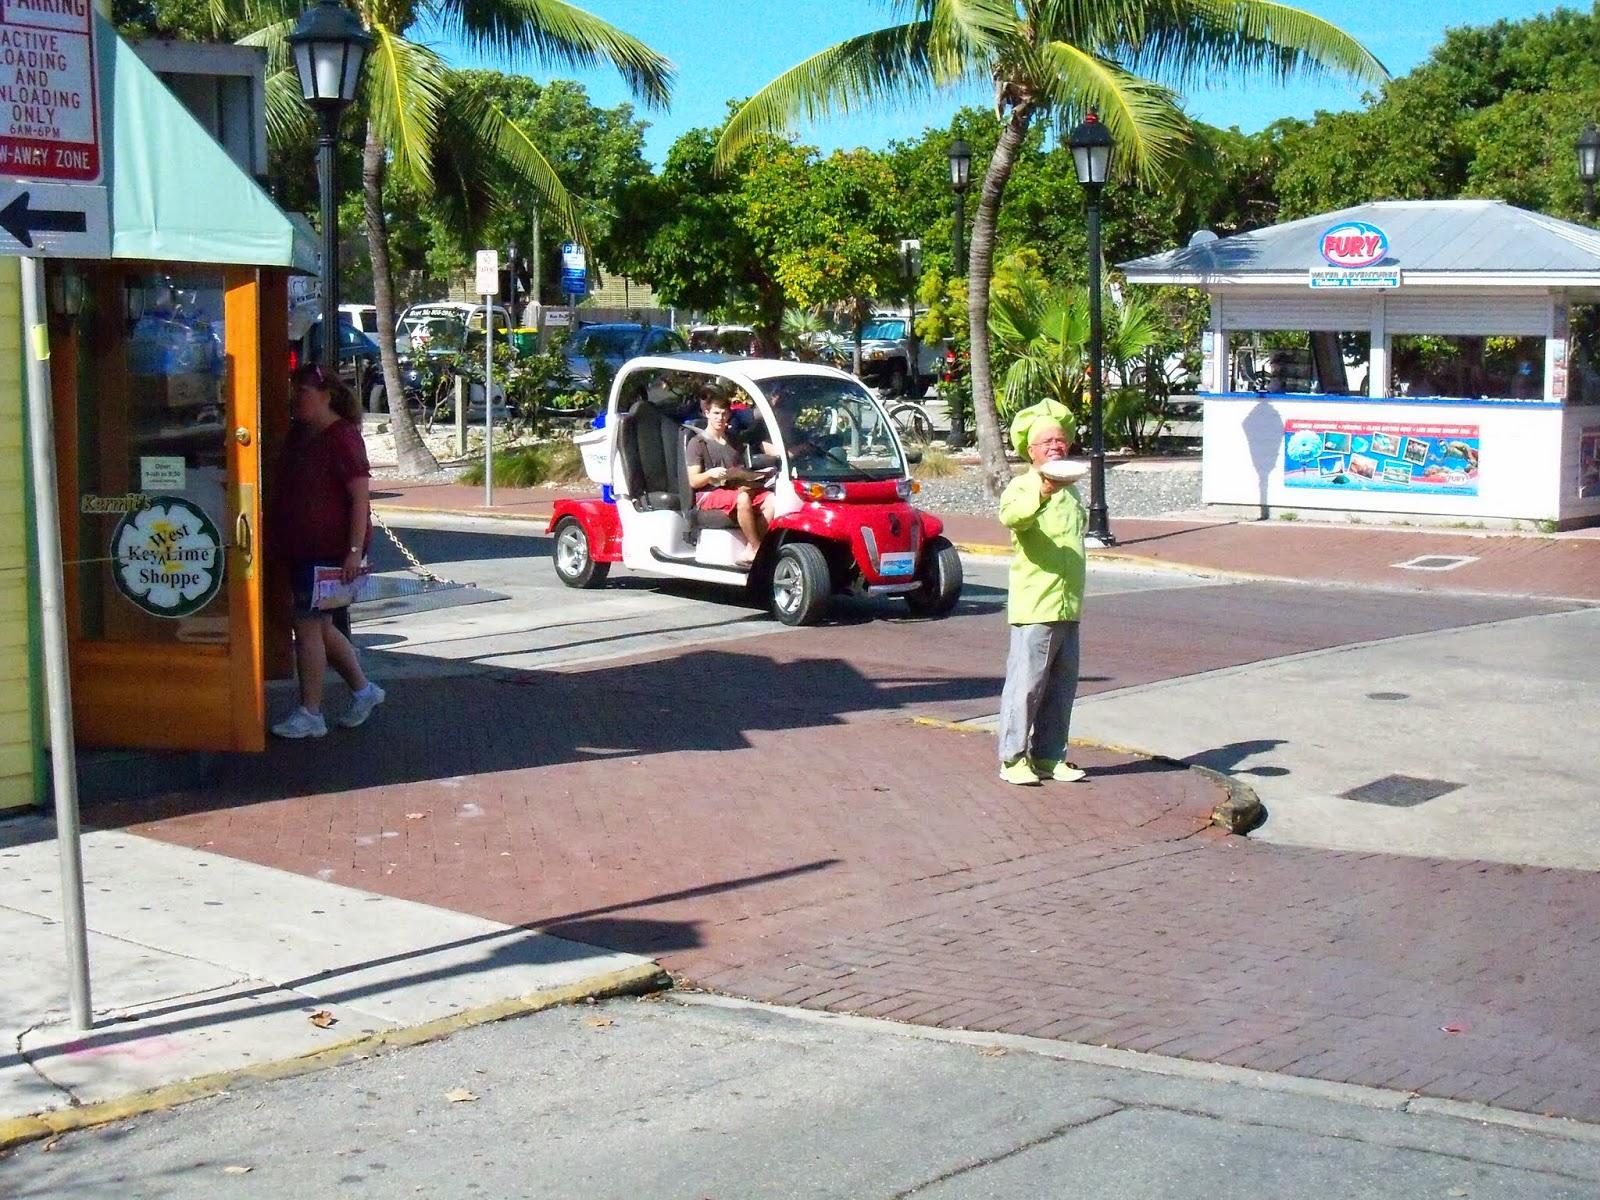 Key West Vacation - 116_5706.JPG